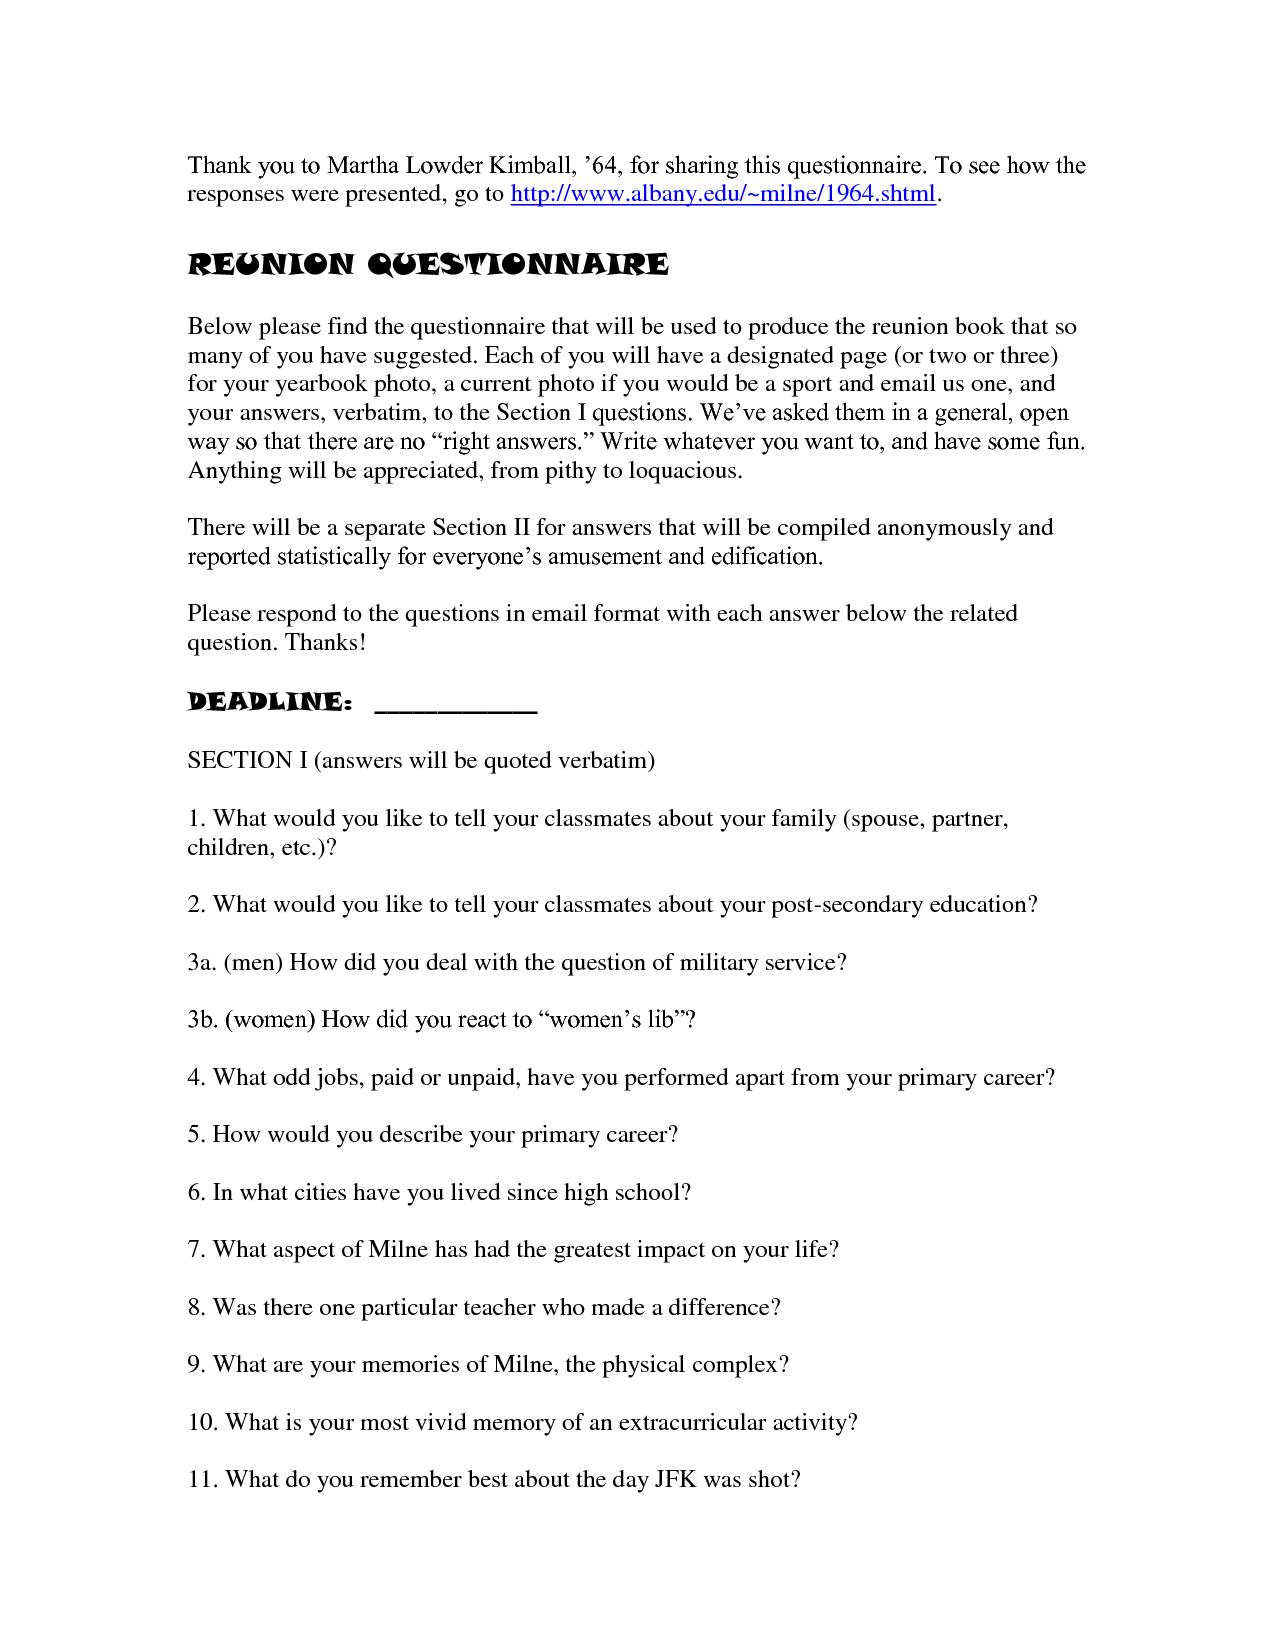 High School Reunion Questionnaire